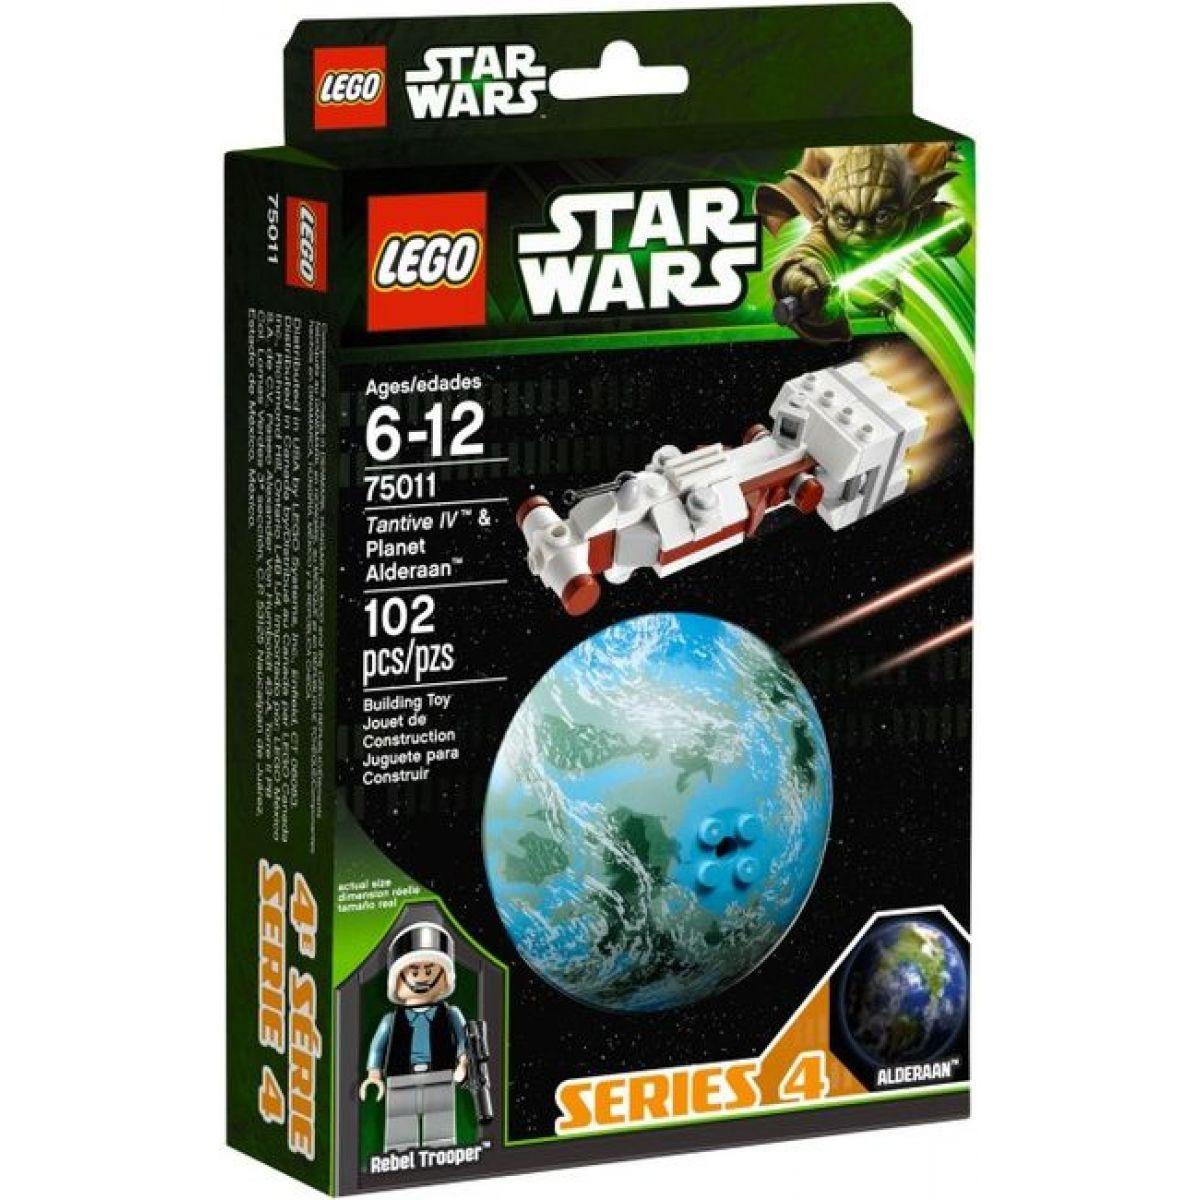 LEGO Star Wars 75011 Tantive IV & Planet Alderaan